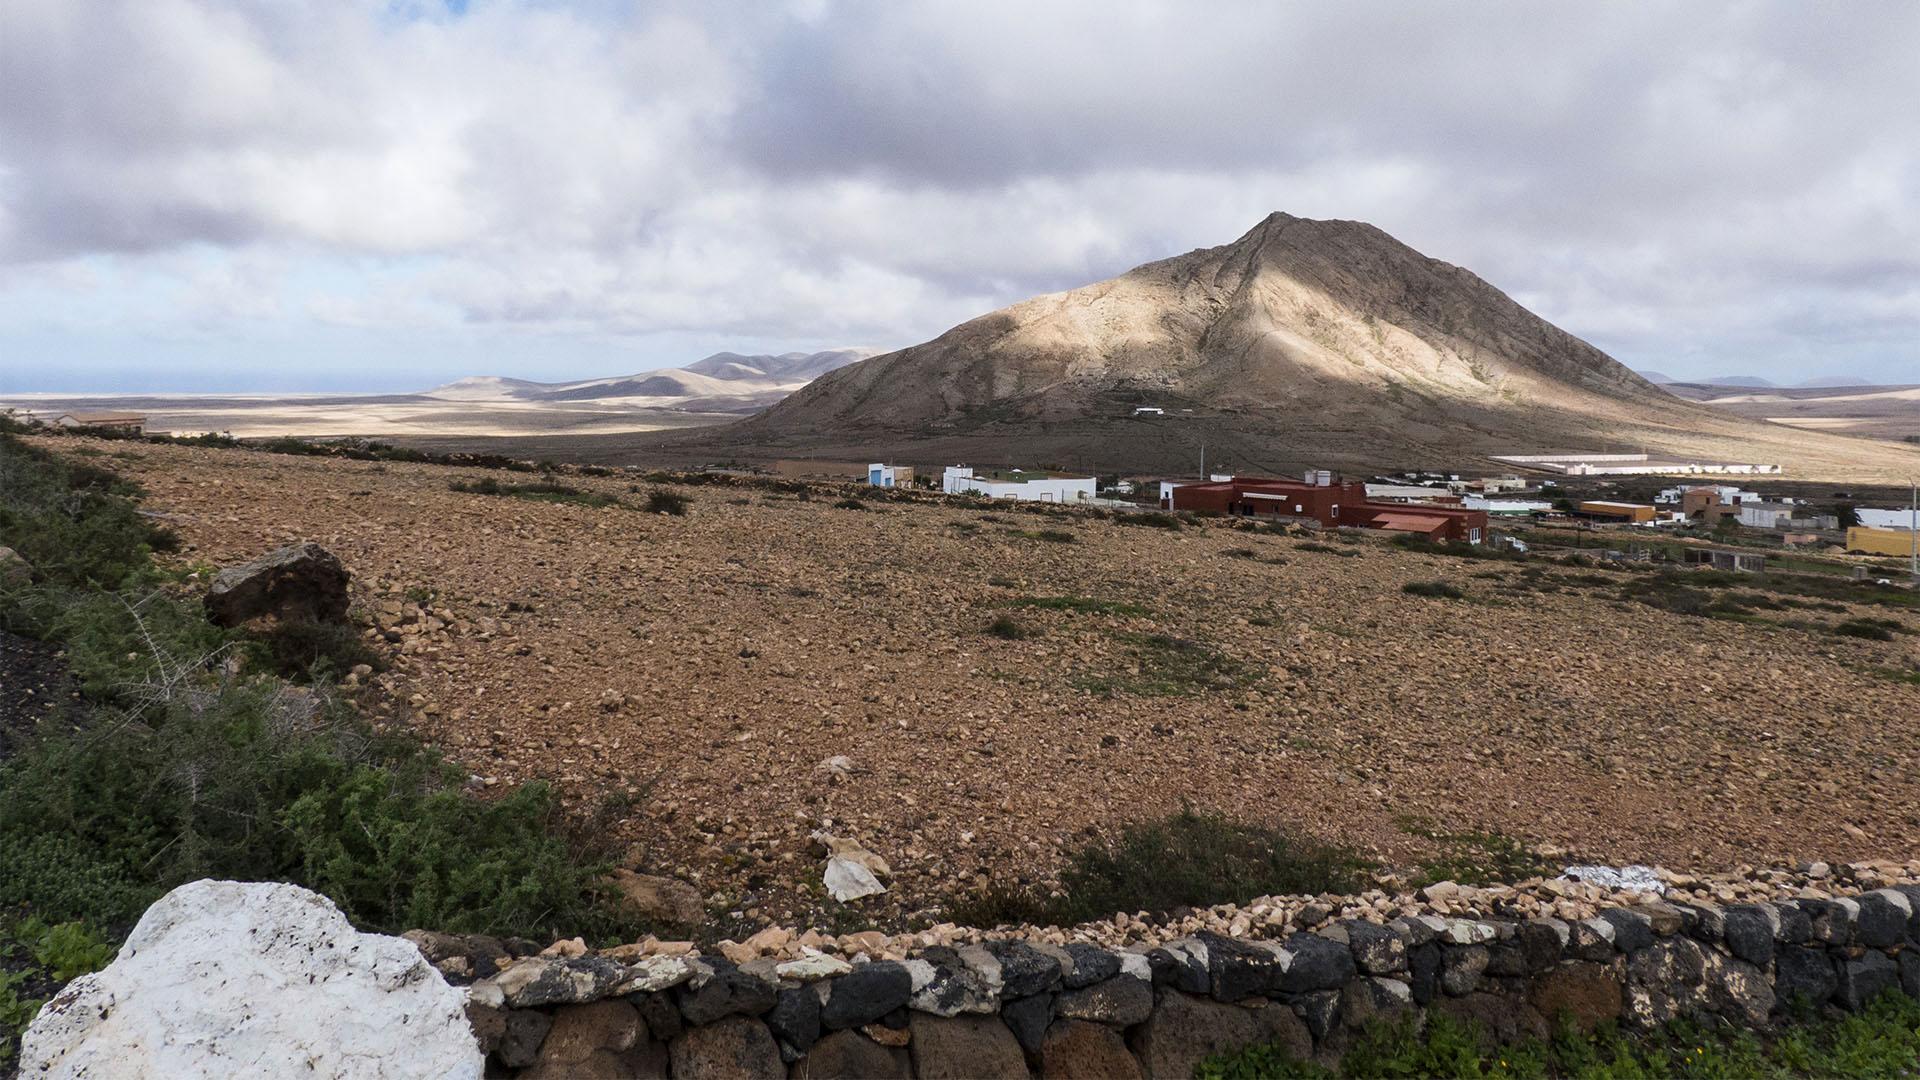 Sehenswürdigkeiten Fuerteventuras: Tindaya – Montaña Tindaya